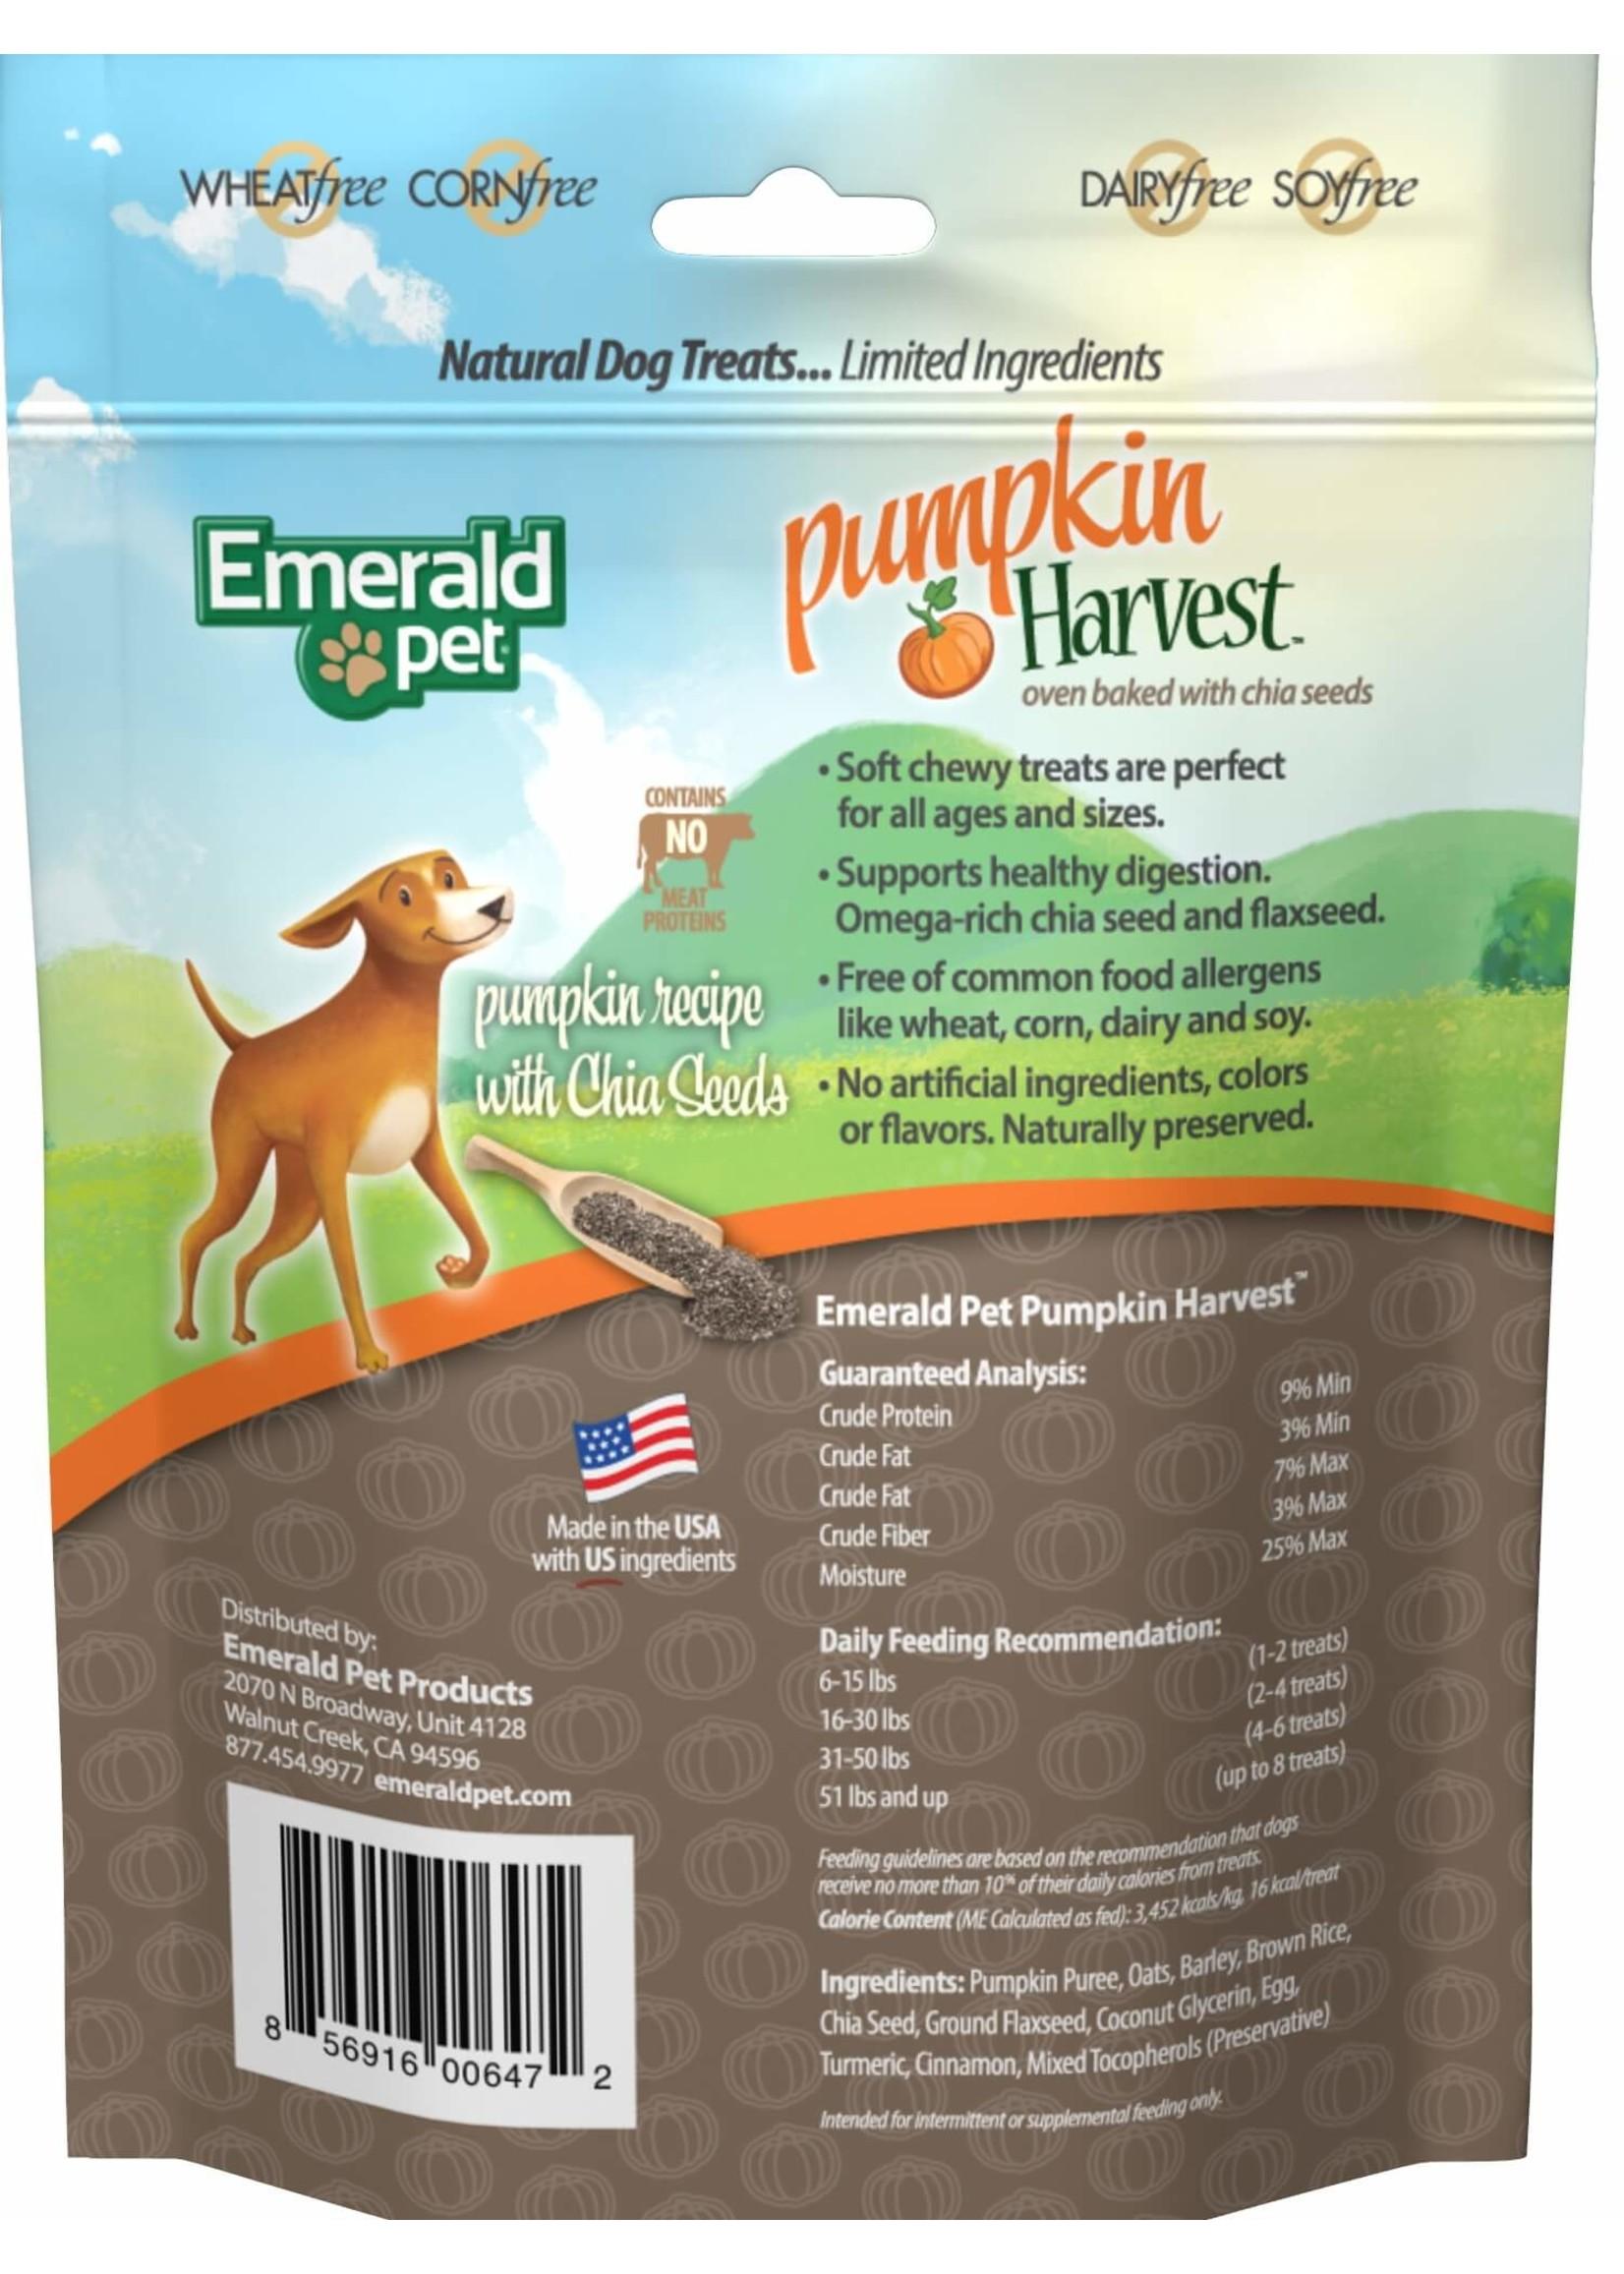 Emerald Pet Emerald Pet Pumpkin Harvest Chews with Apple Dog Treat6 oz